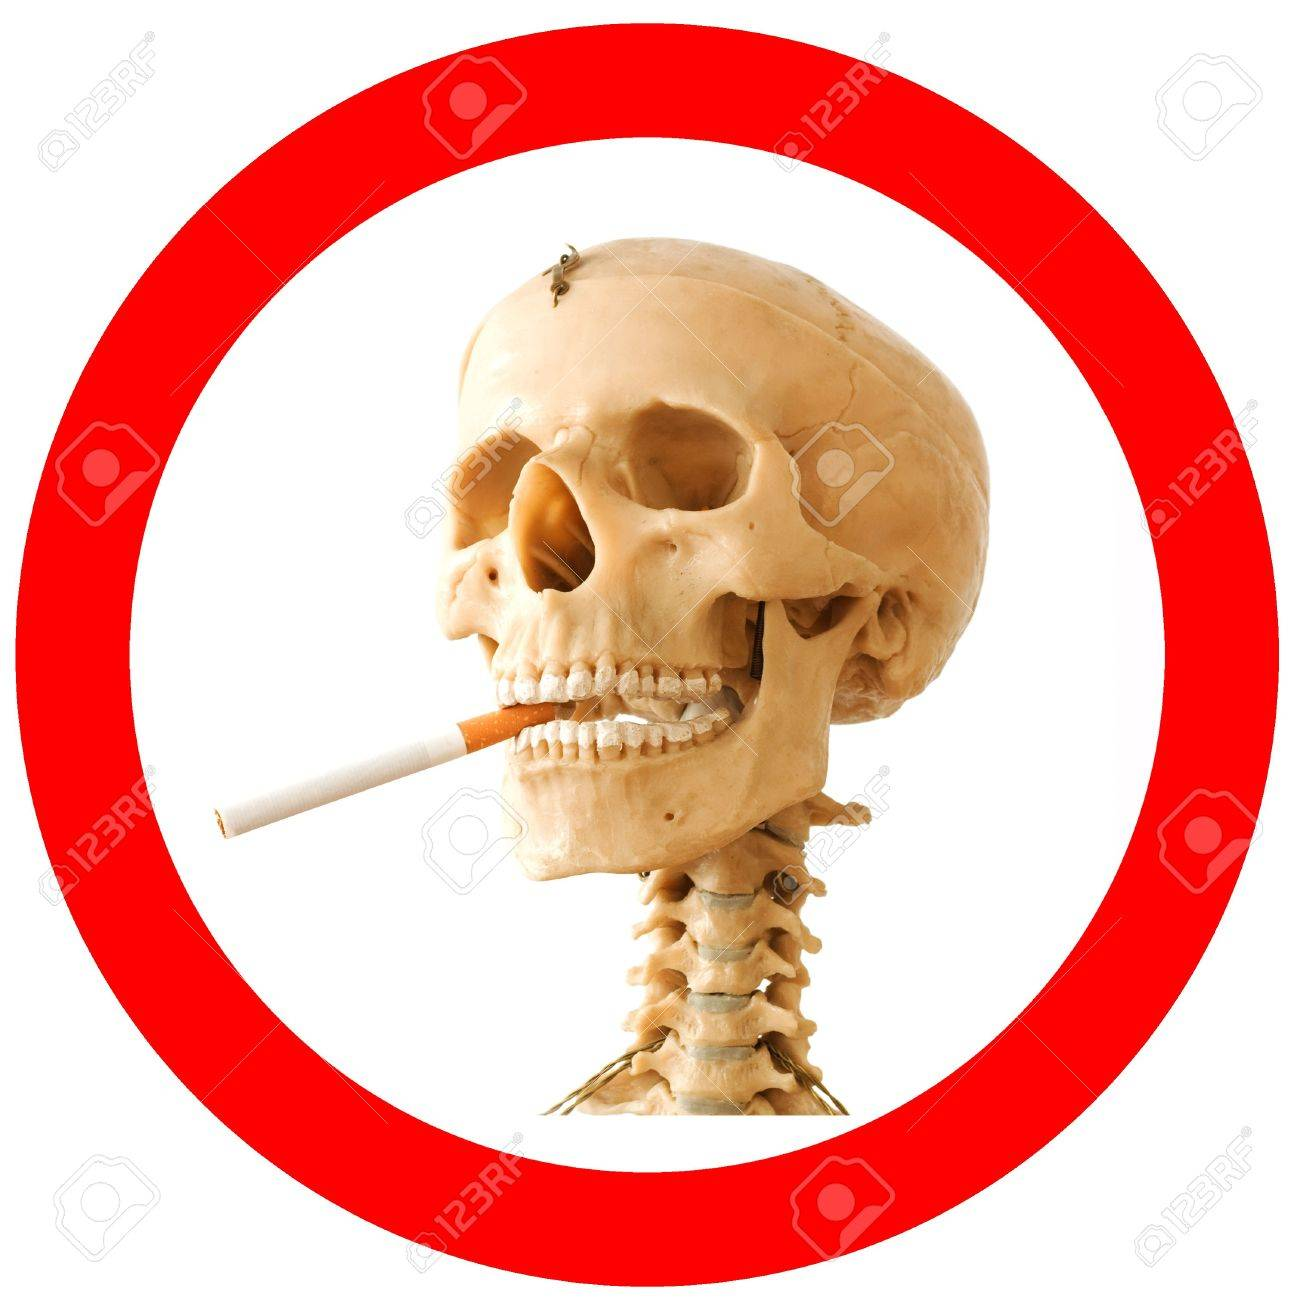 Smoking kills sign with skeleton Stock Photo - 6250906